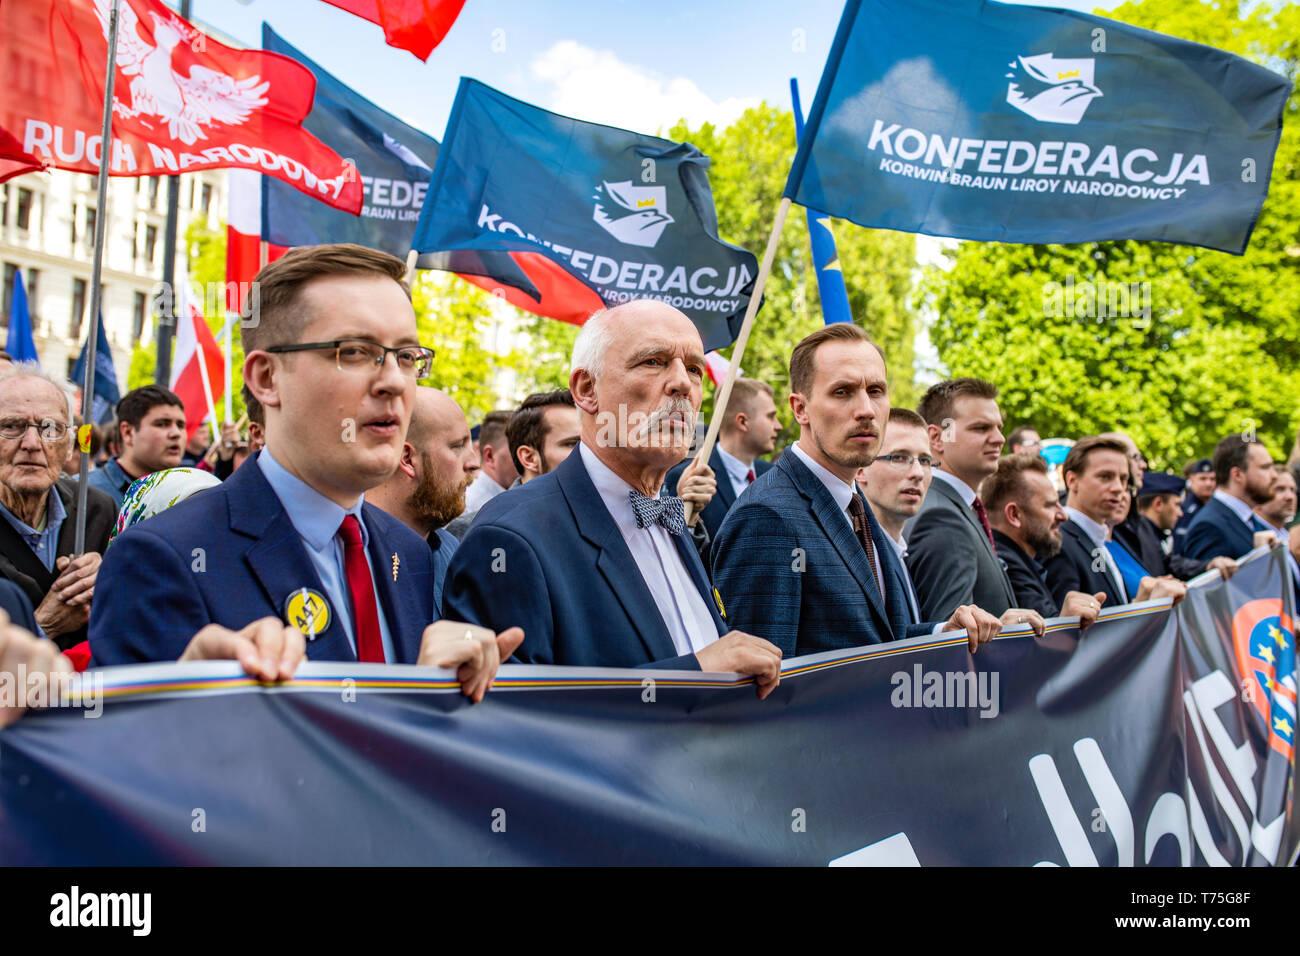 Varsovia / Polonia: Los nacionalistas (Konfederacja KORWiN Braun Liroy Narodowcy) manifestándose contra la Unión Europea. Imagen De Stock